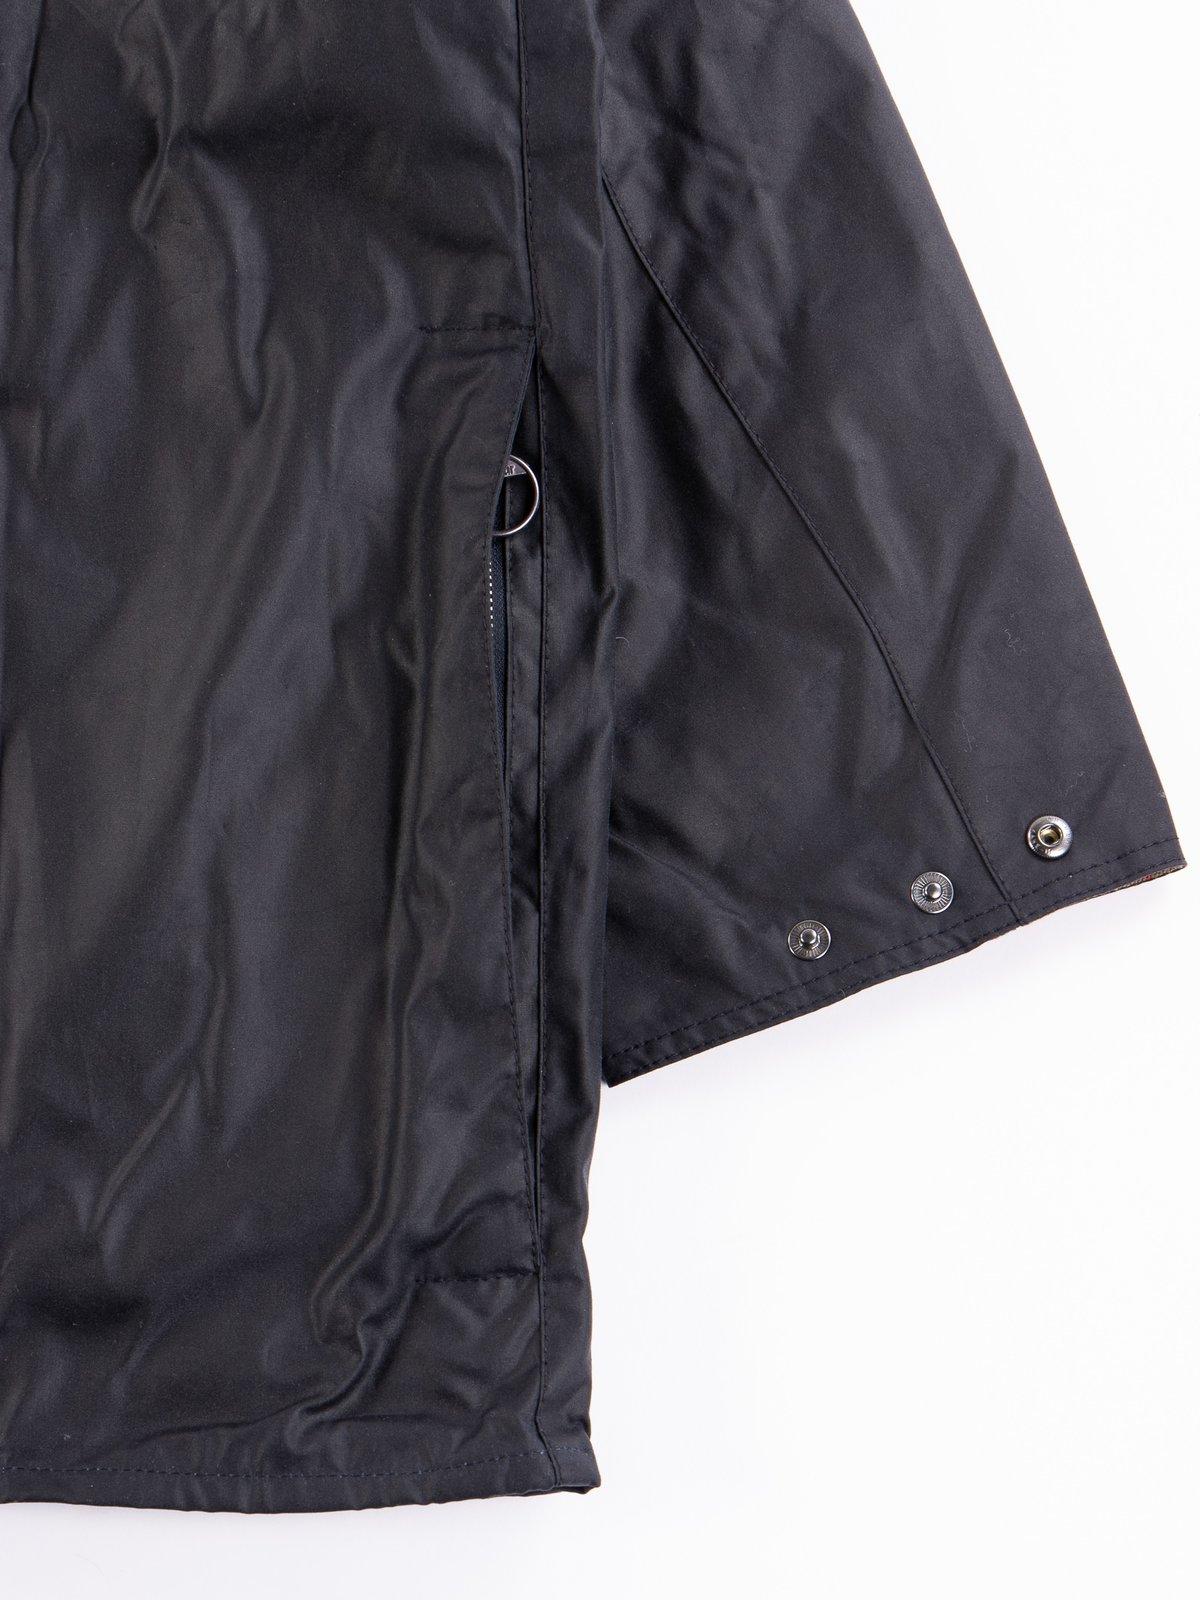 Navy Oversized Beaufort Waxed Cotton Jacket - Image 6